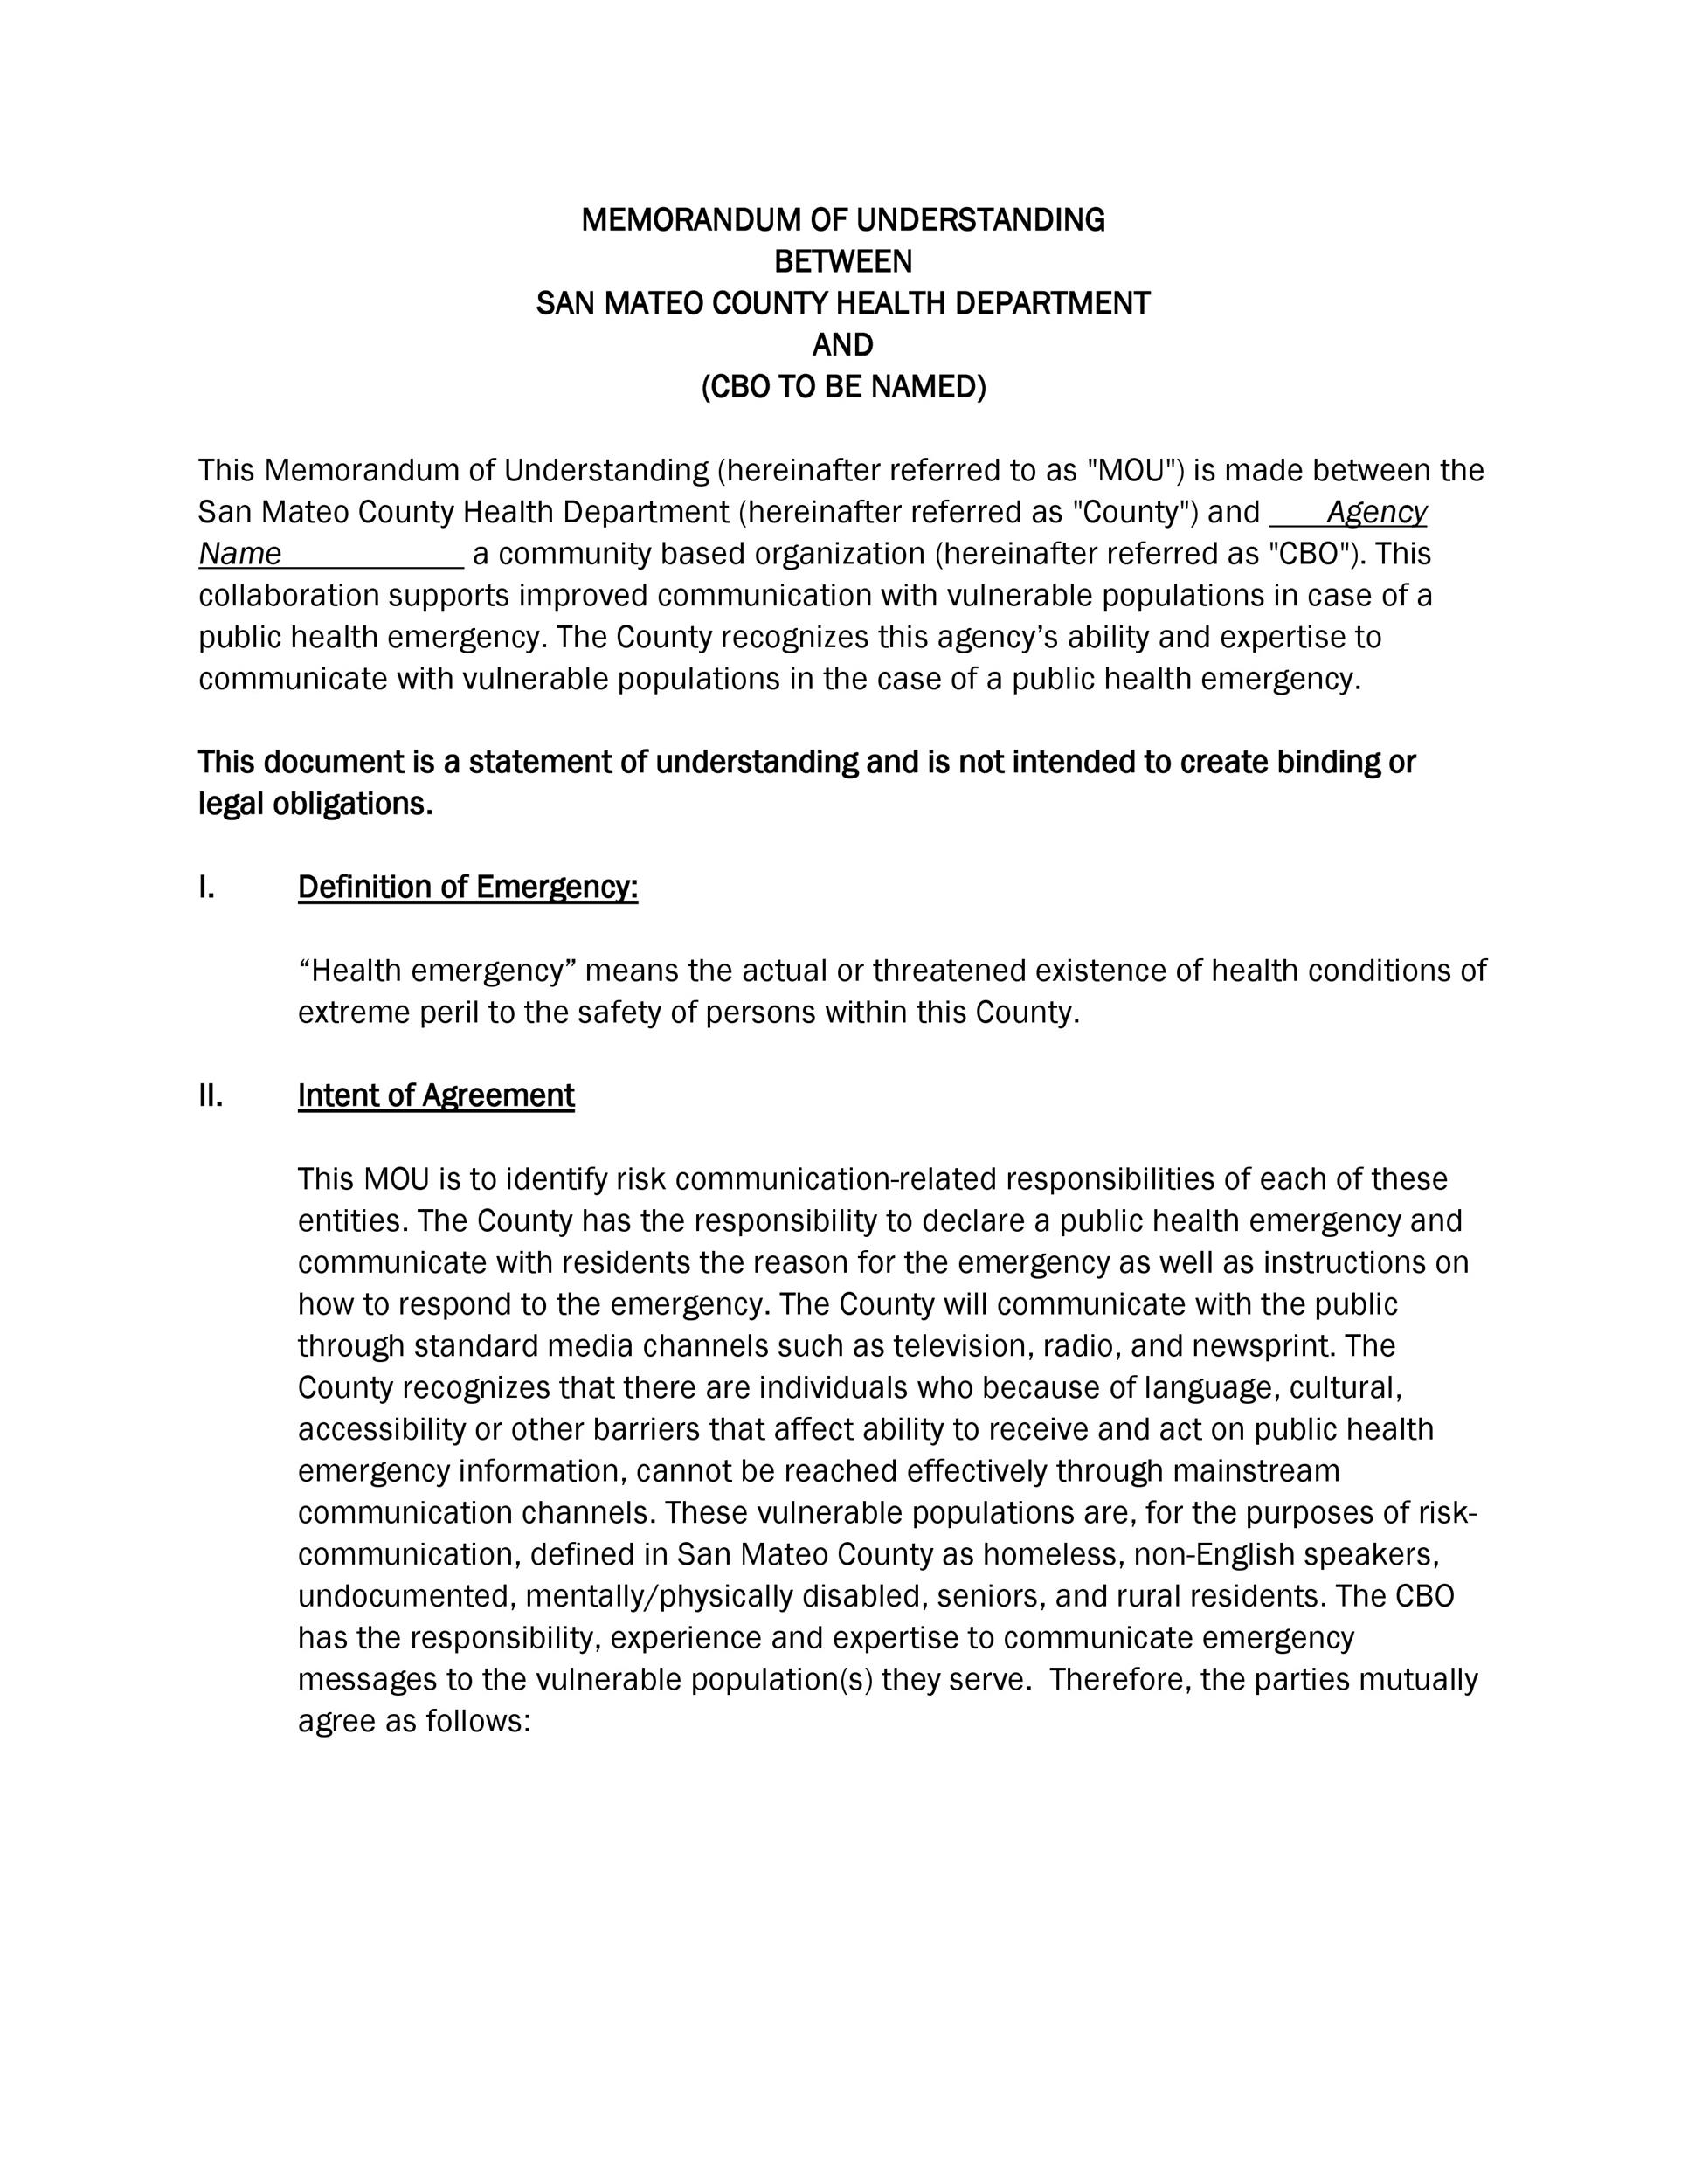 Free Memorandum of Understanding Template 11